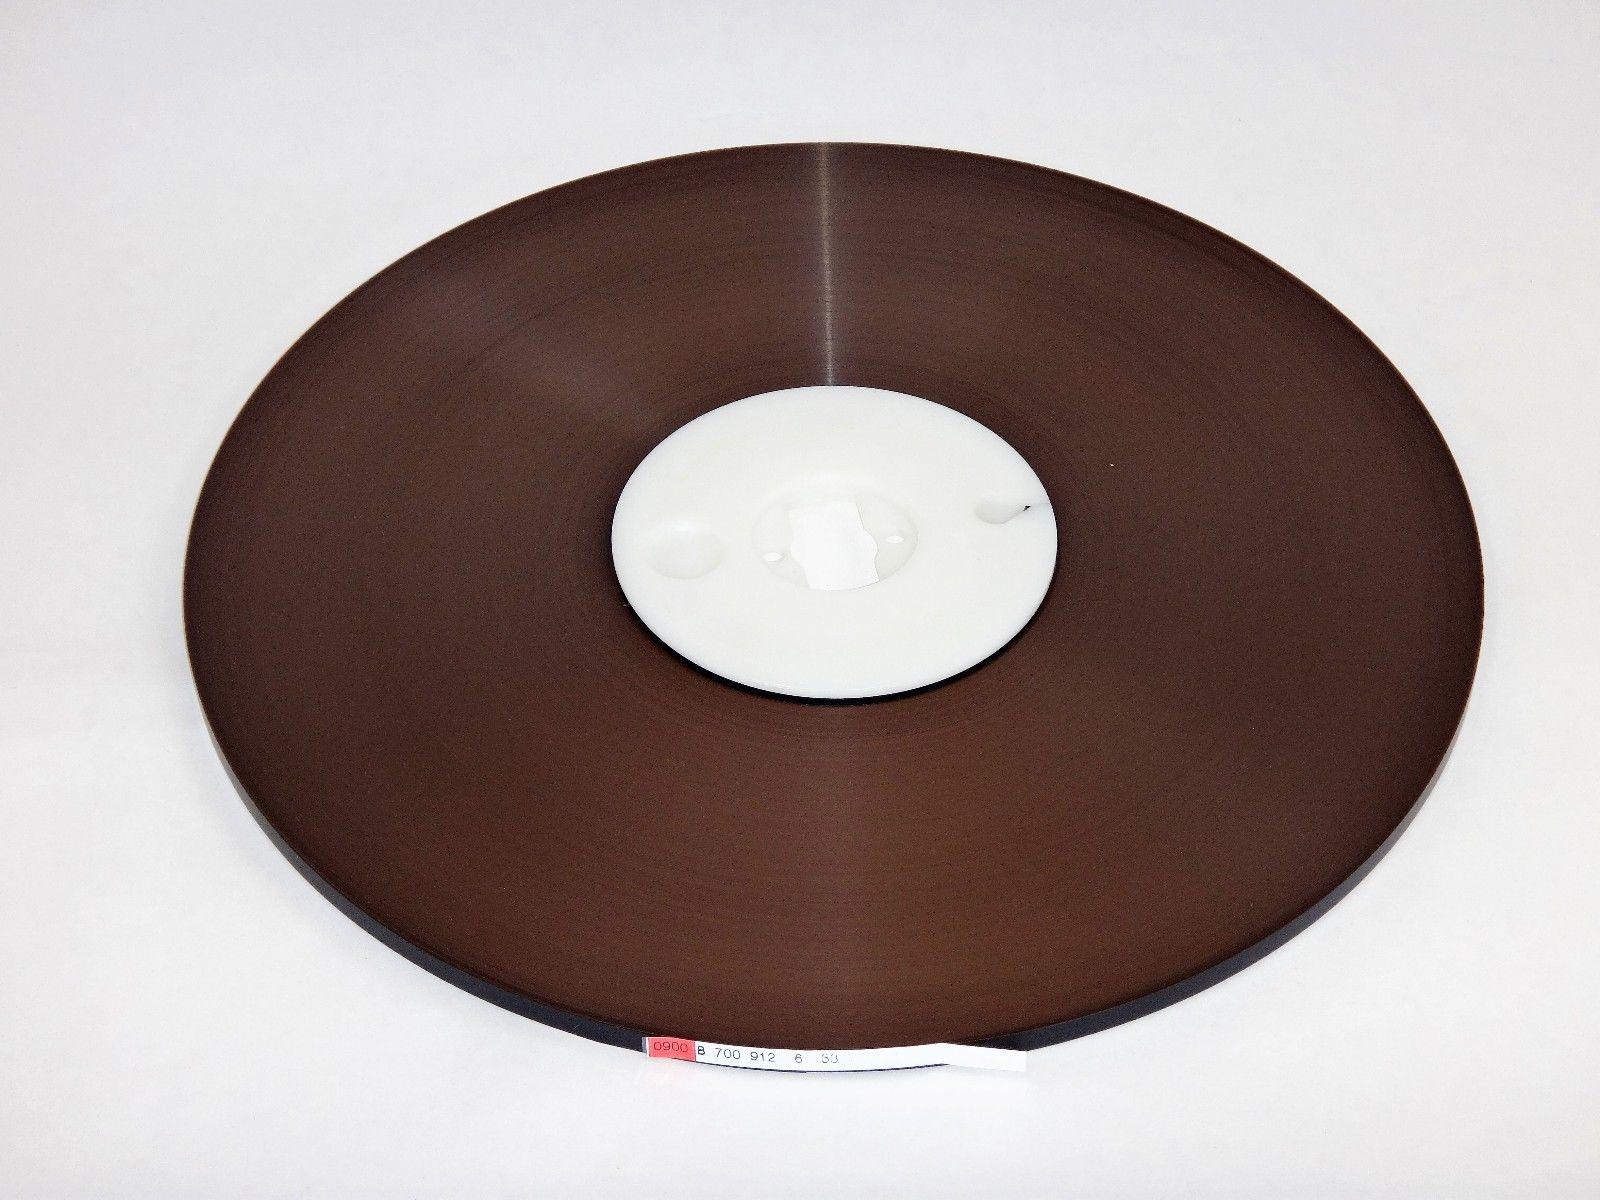 NEW RMGI PYRAL BASF RTM SM911 1/4″ 3608′ 1100m 11.4″ Pancake AEG ECO Pack R34146